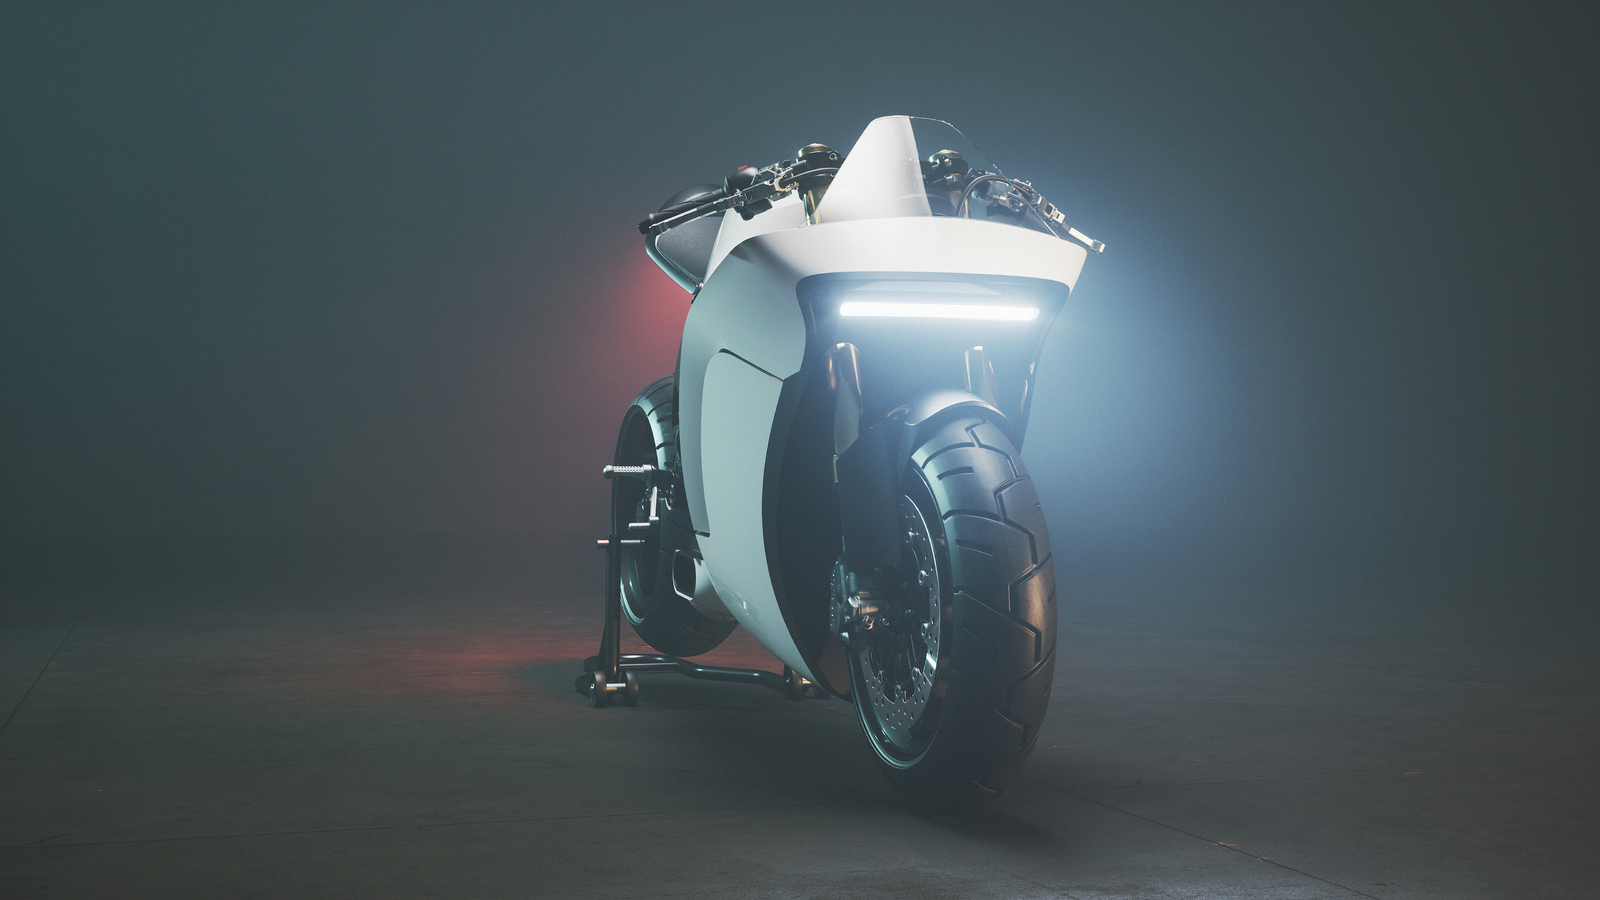 moto-racer-f-strom-cgi-5k-4v.jpg